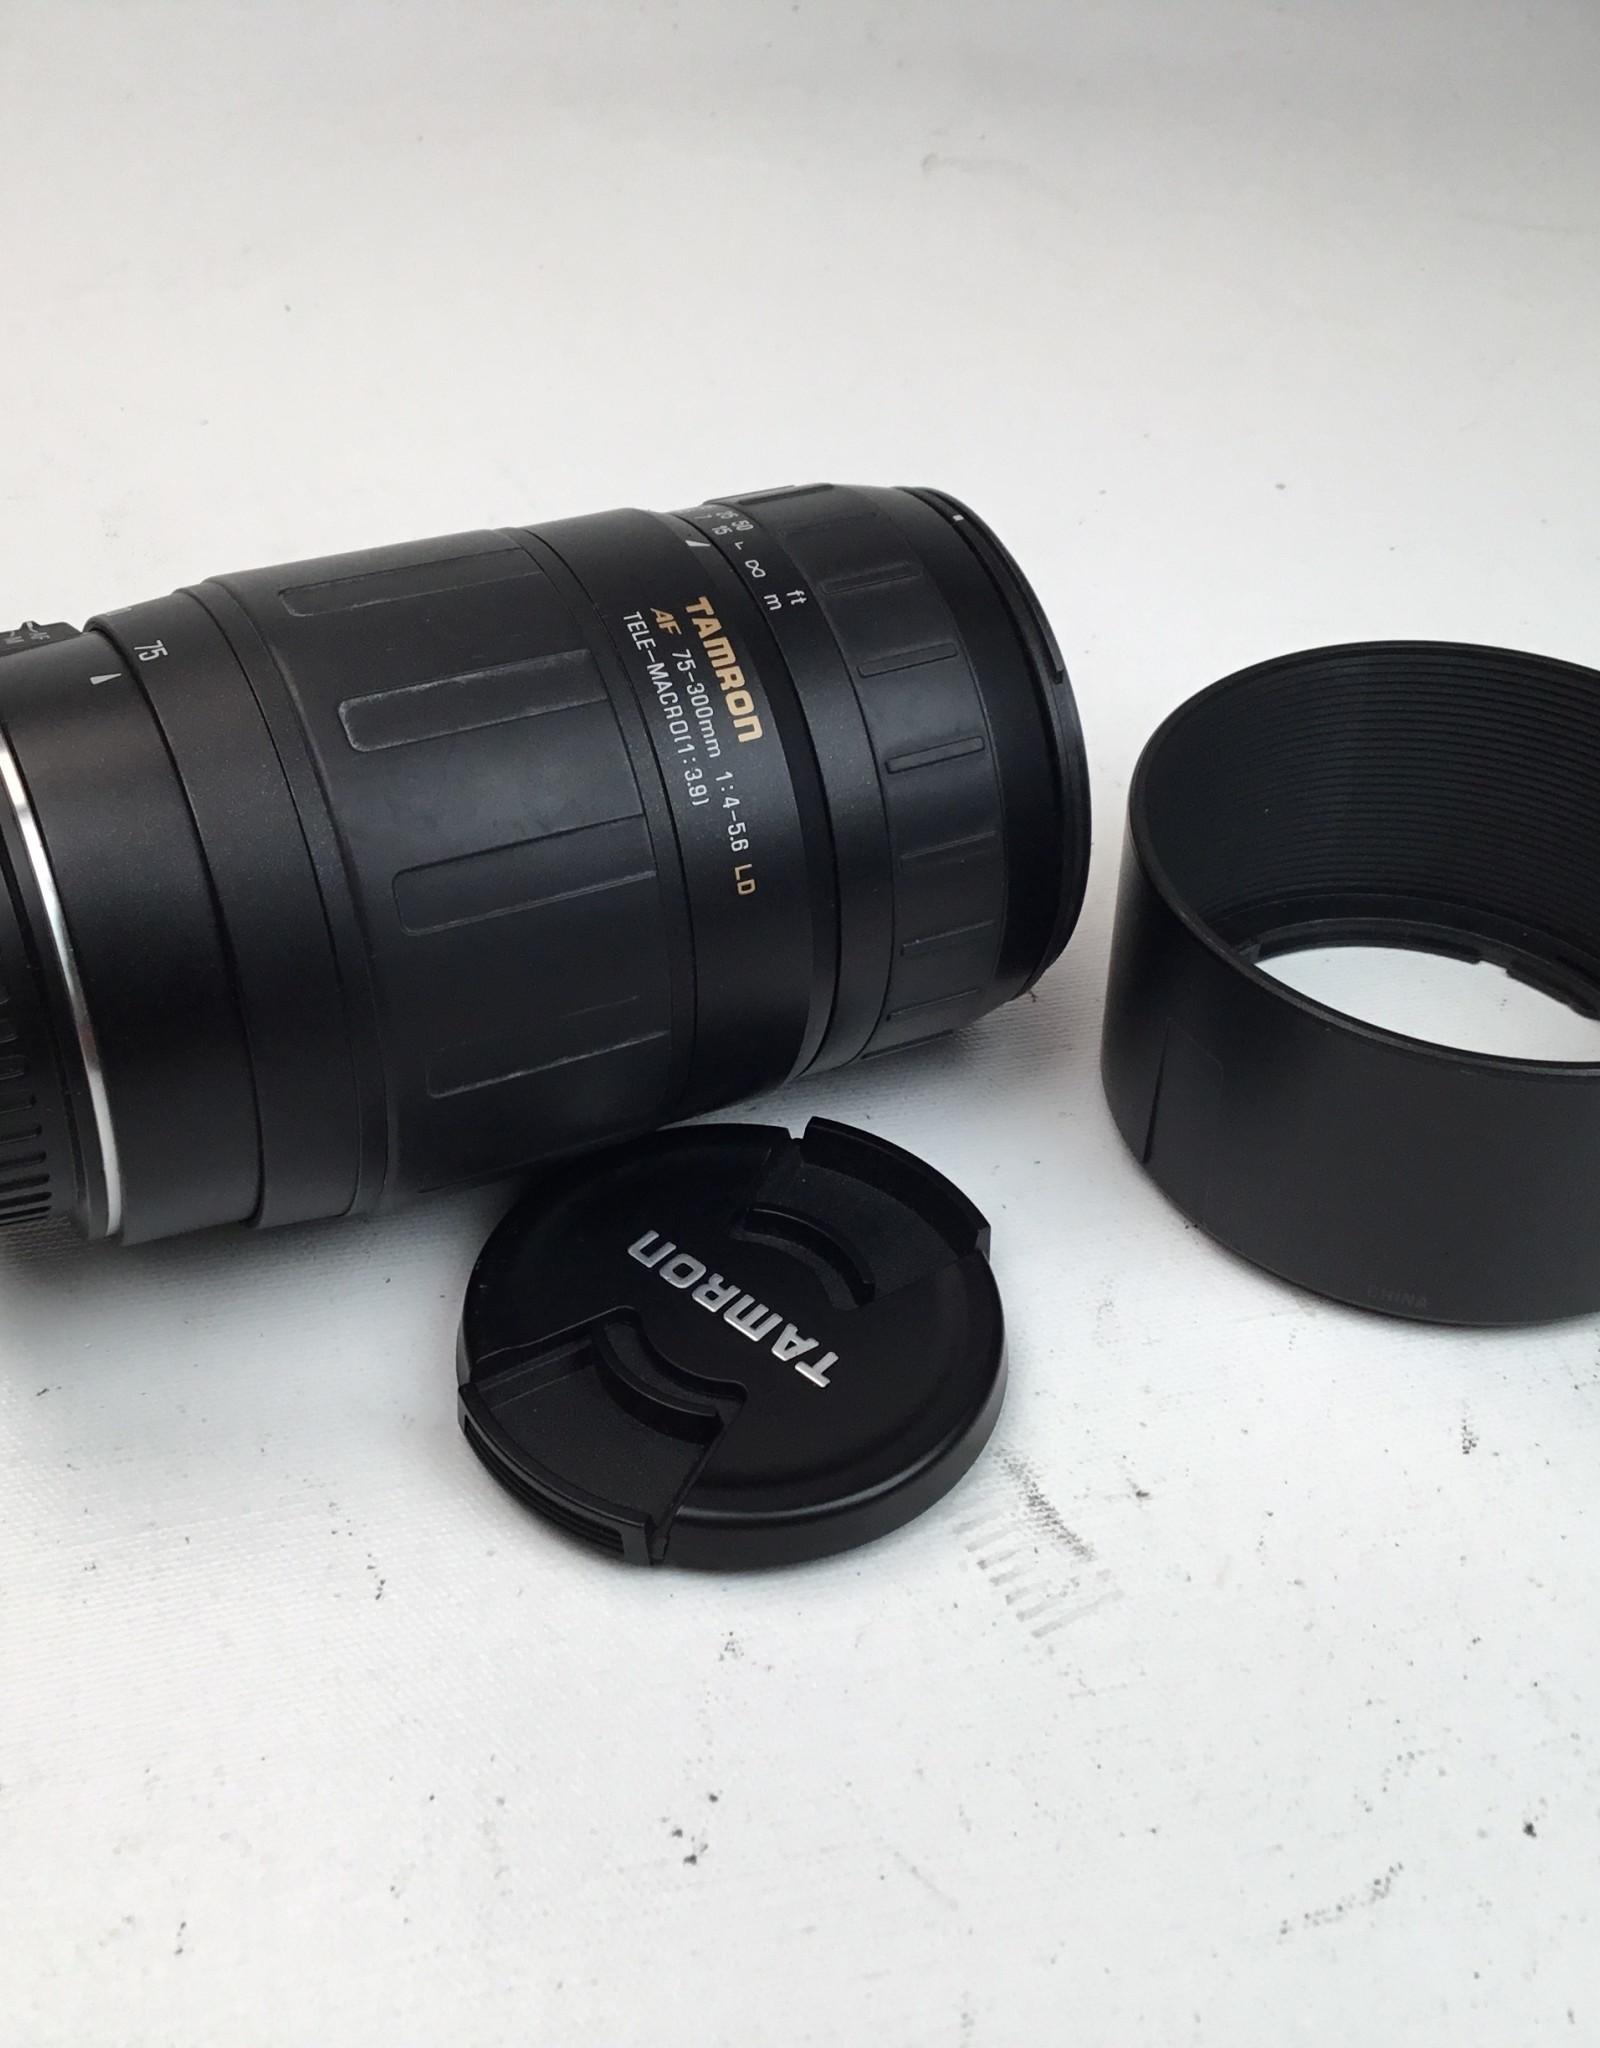 TAMRON Tamron 75-300mm f4-5.6 LD Lens for Nikon Used Good